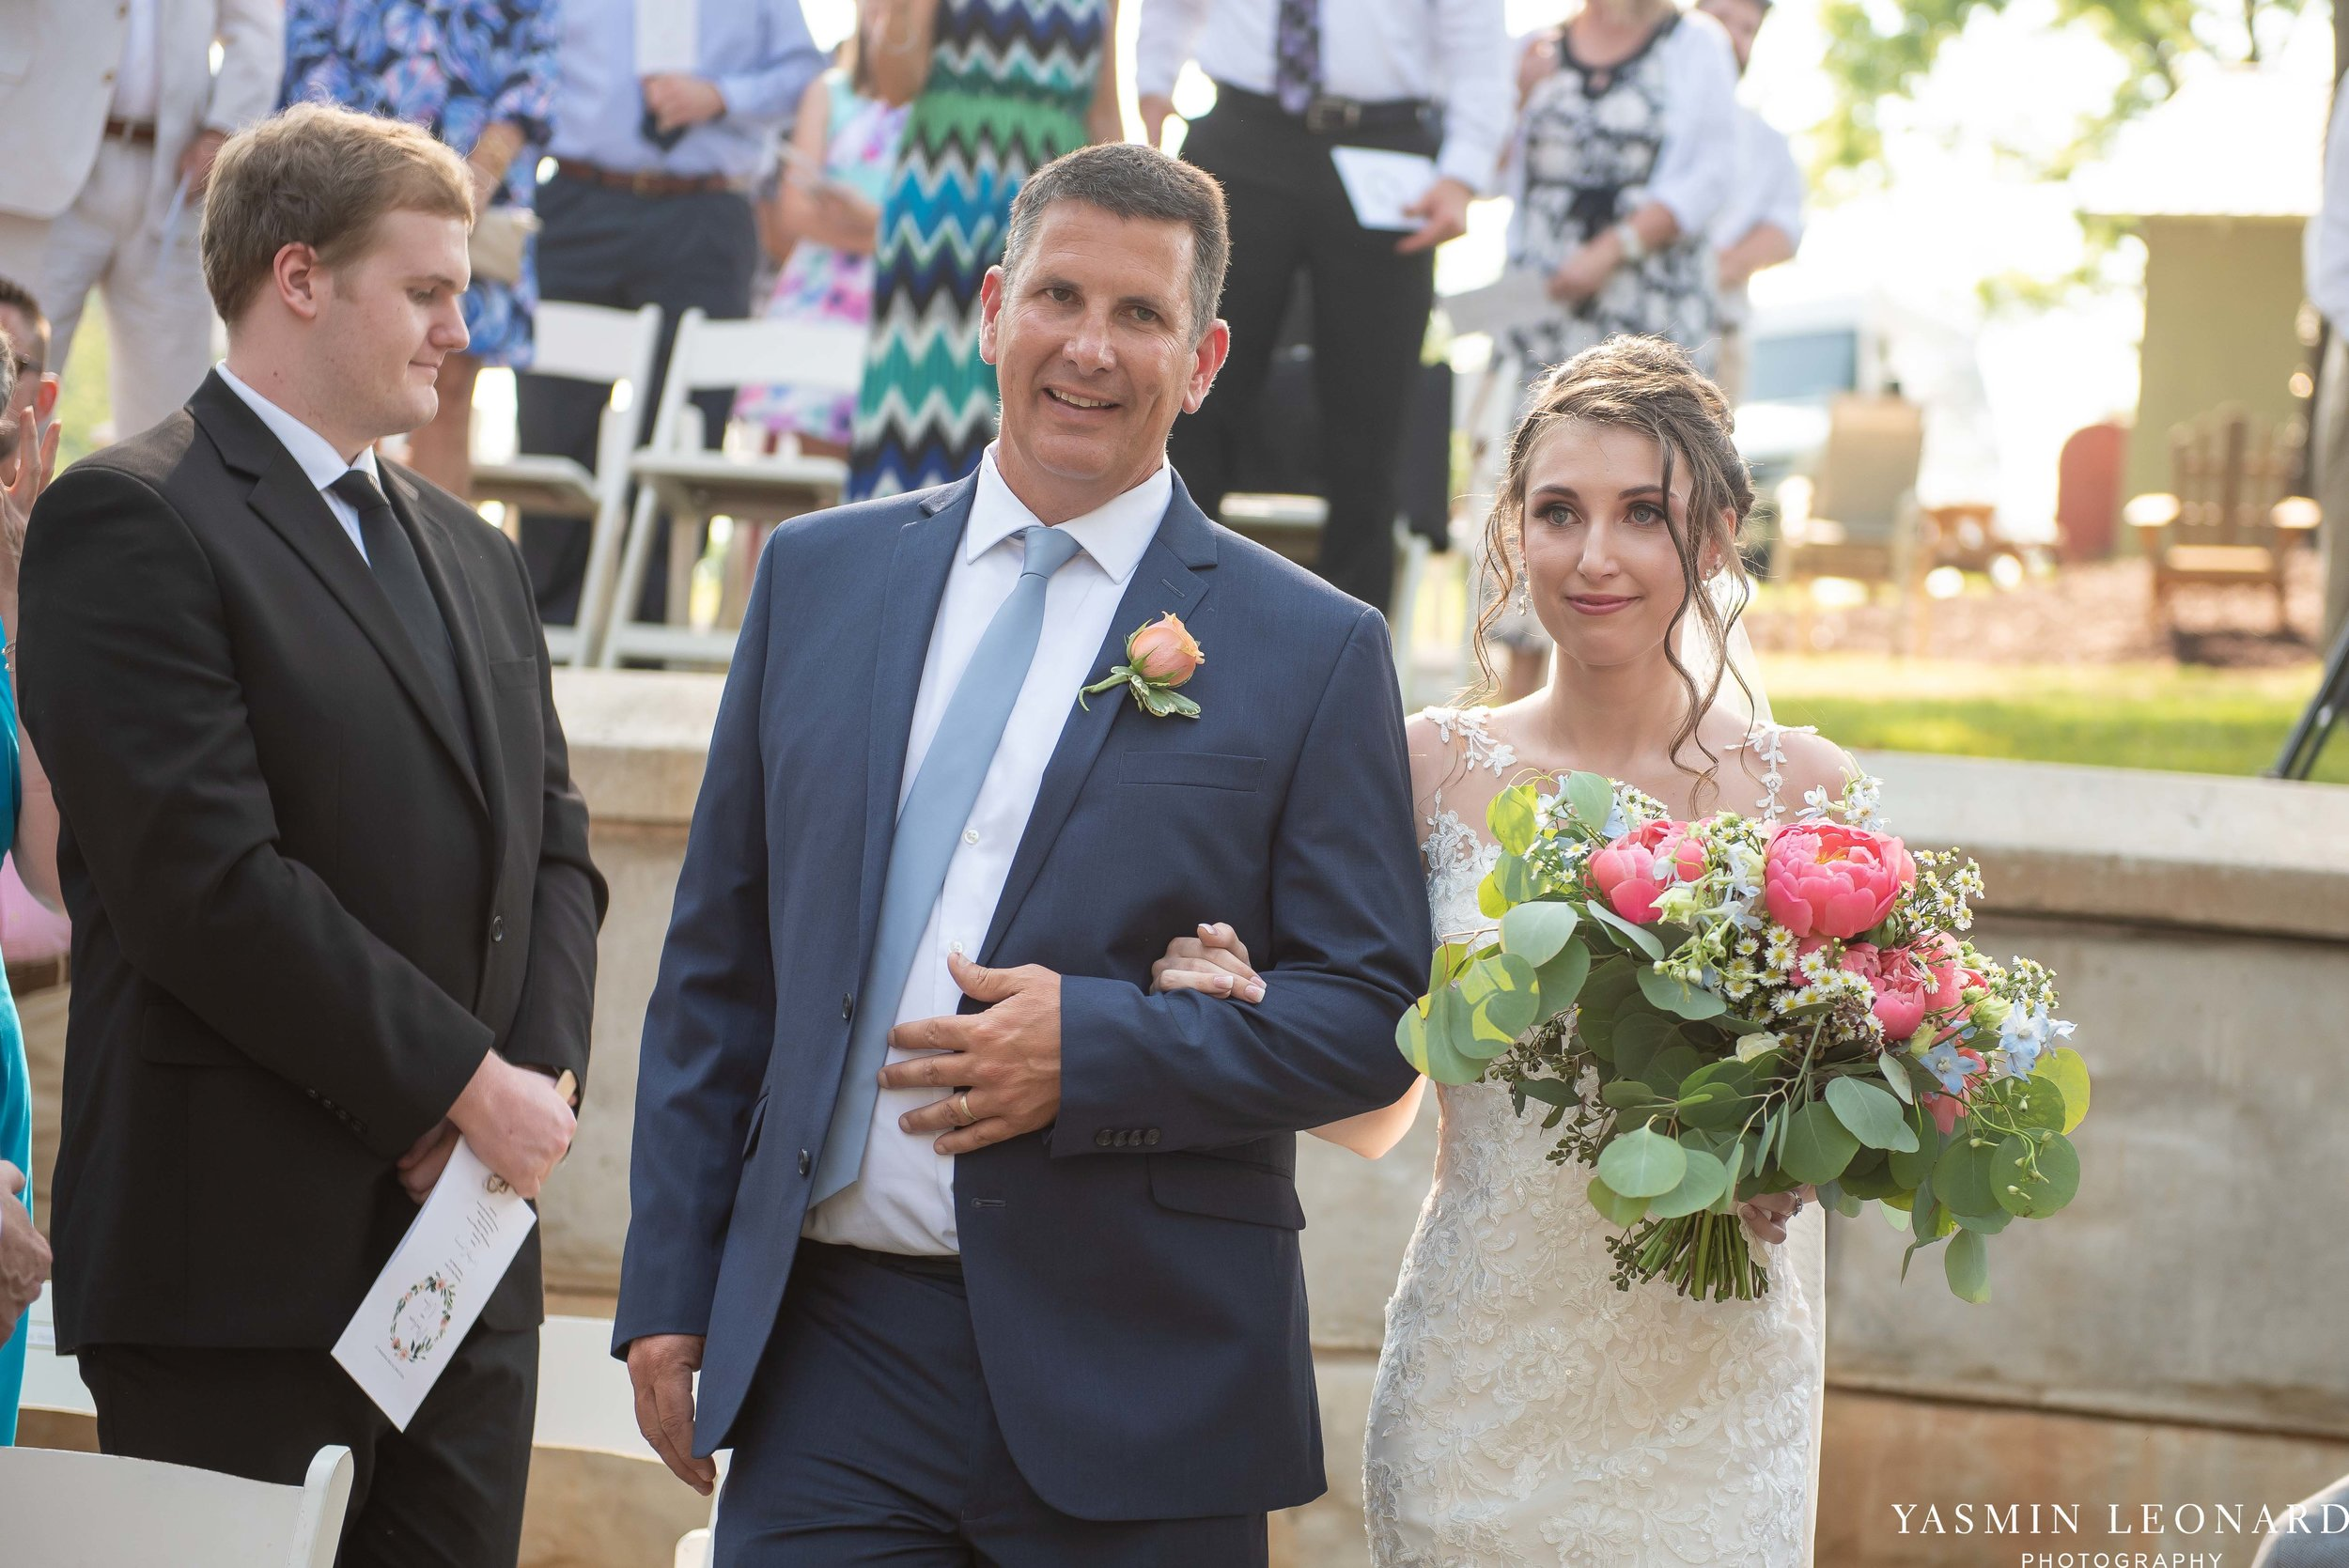 Old Homeplace Vineyard - NC Weddings - Outdoor Summer Weddings - Peony Boutique - Vineyard Wedding - NC Photographer - Yasmin Leonard Photography-26.jpg